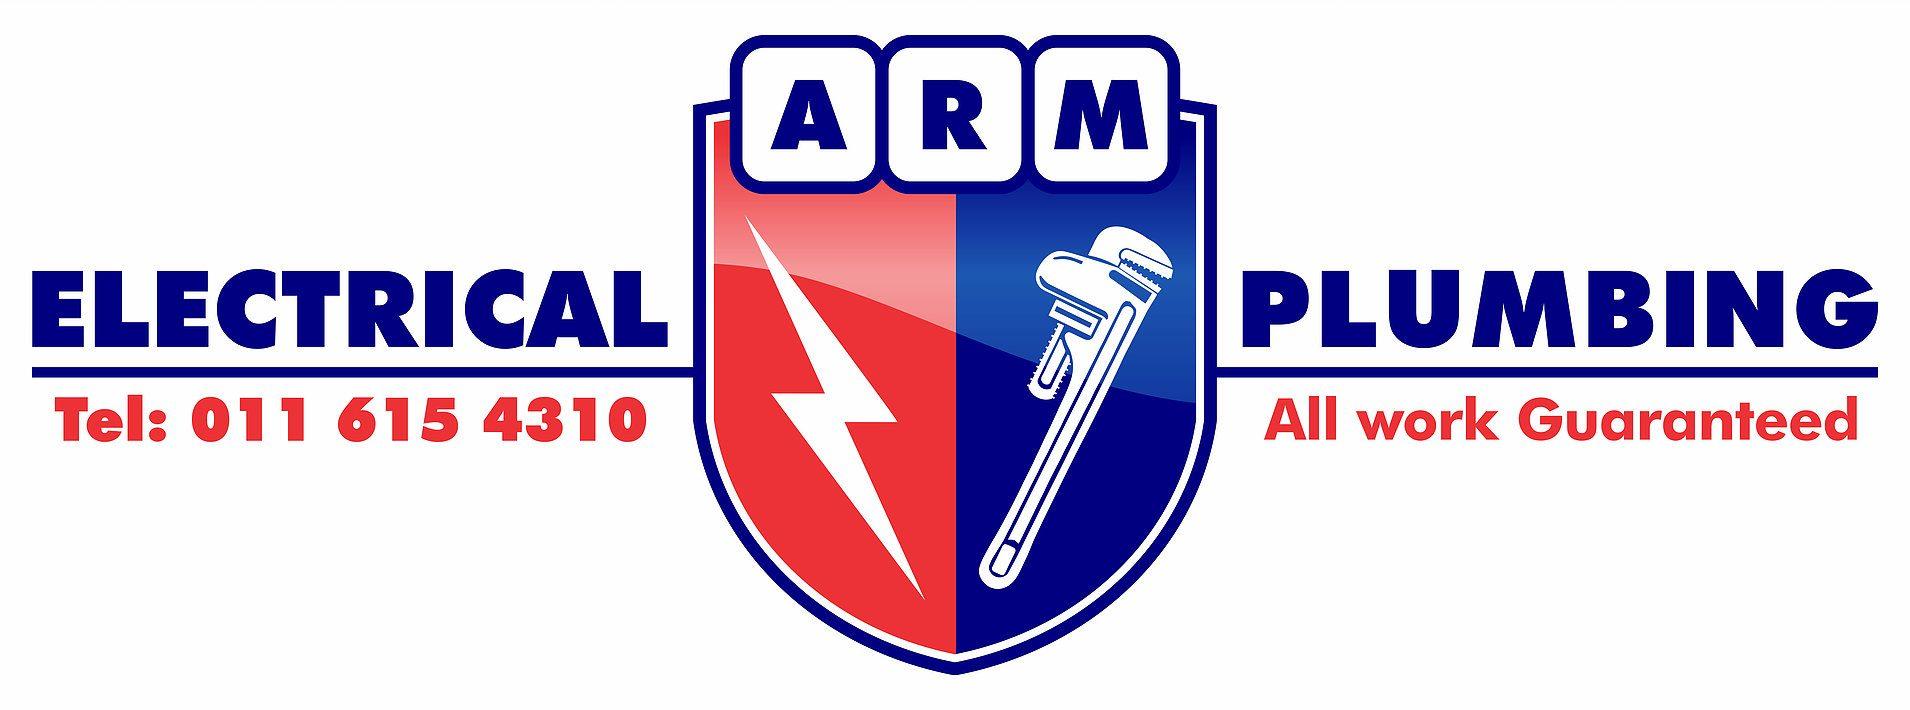 ARM Electrical & Plumbing